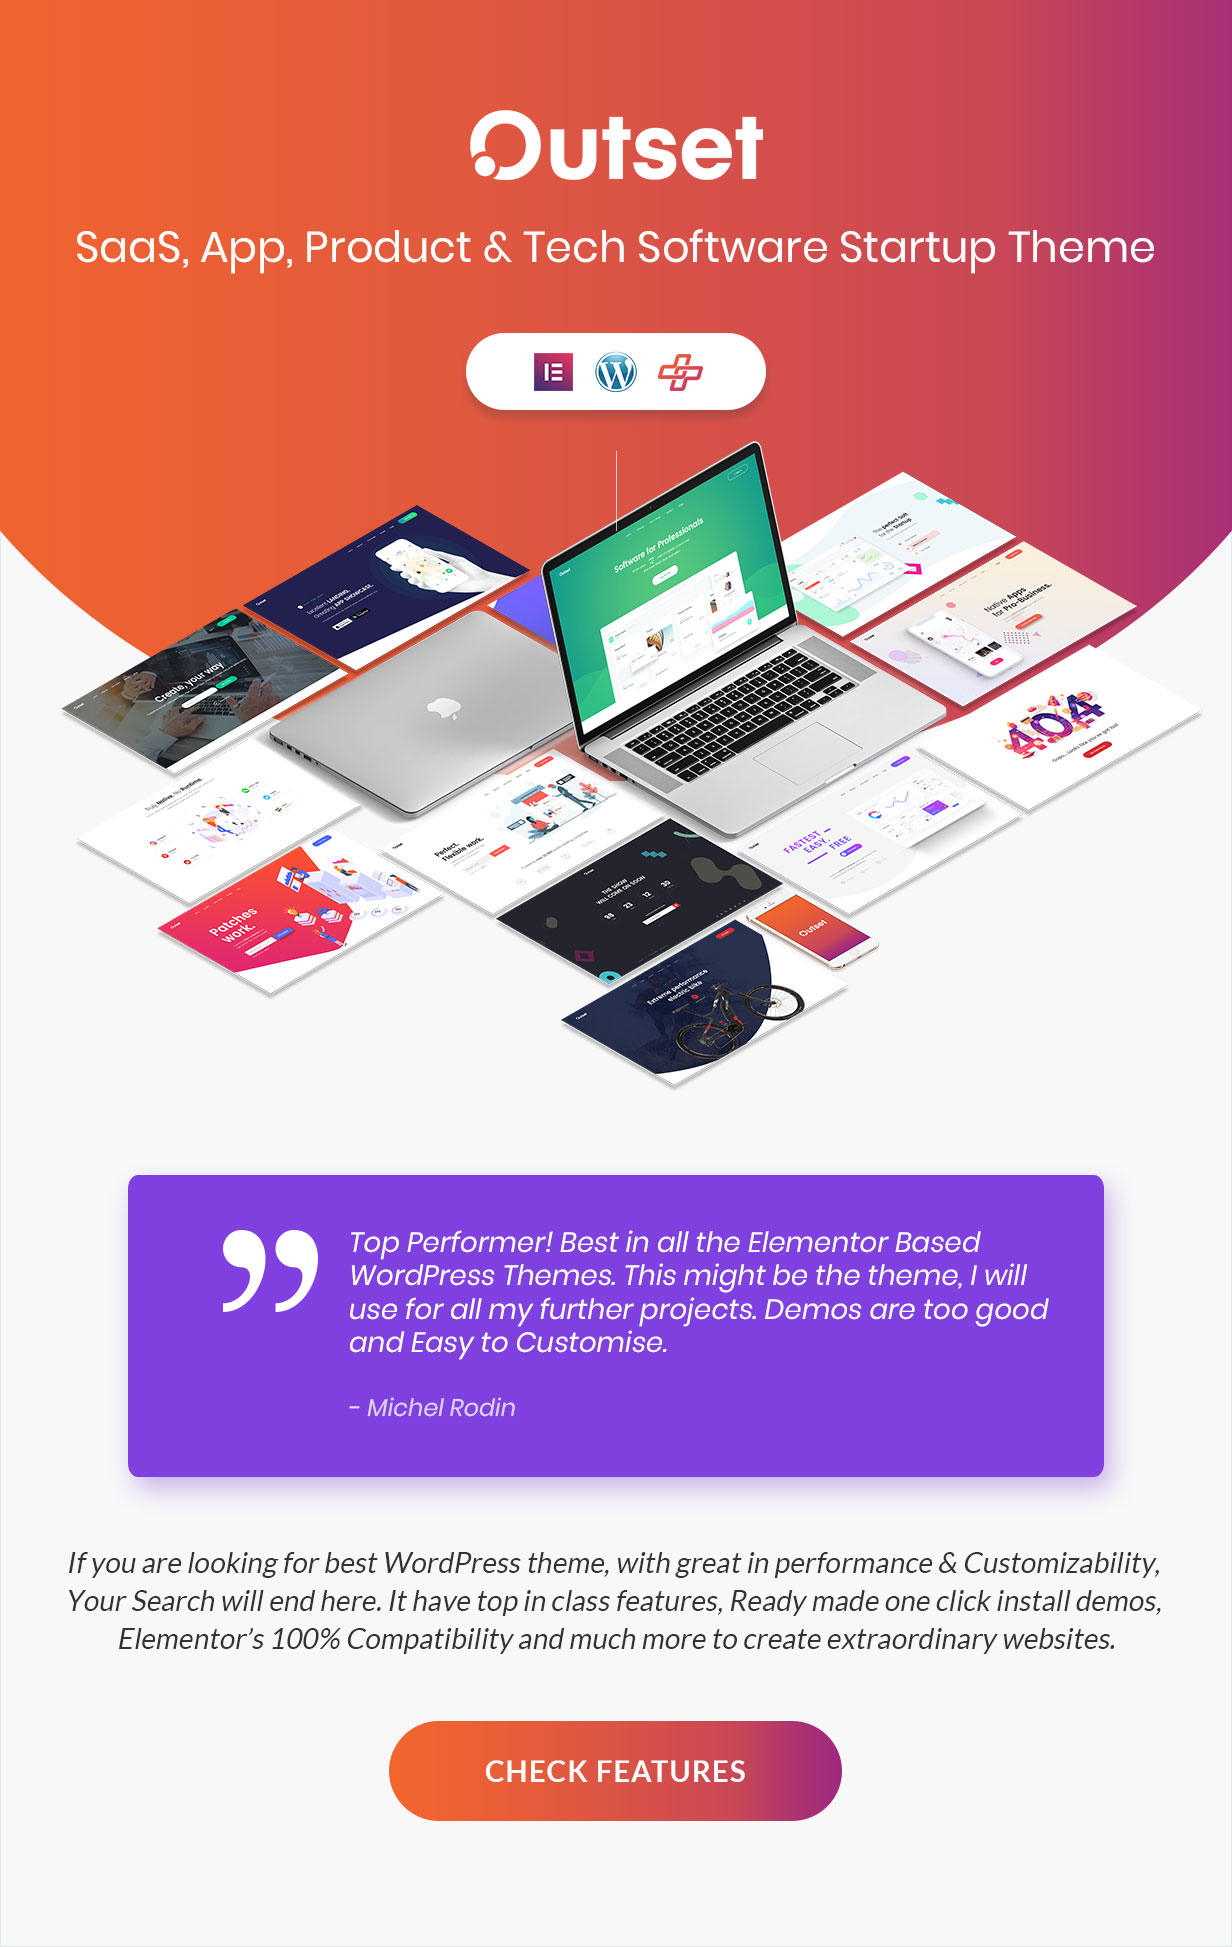 The Outset - MultiPurpose WordPress Theme for Saas & Startup - 1